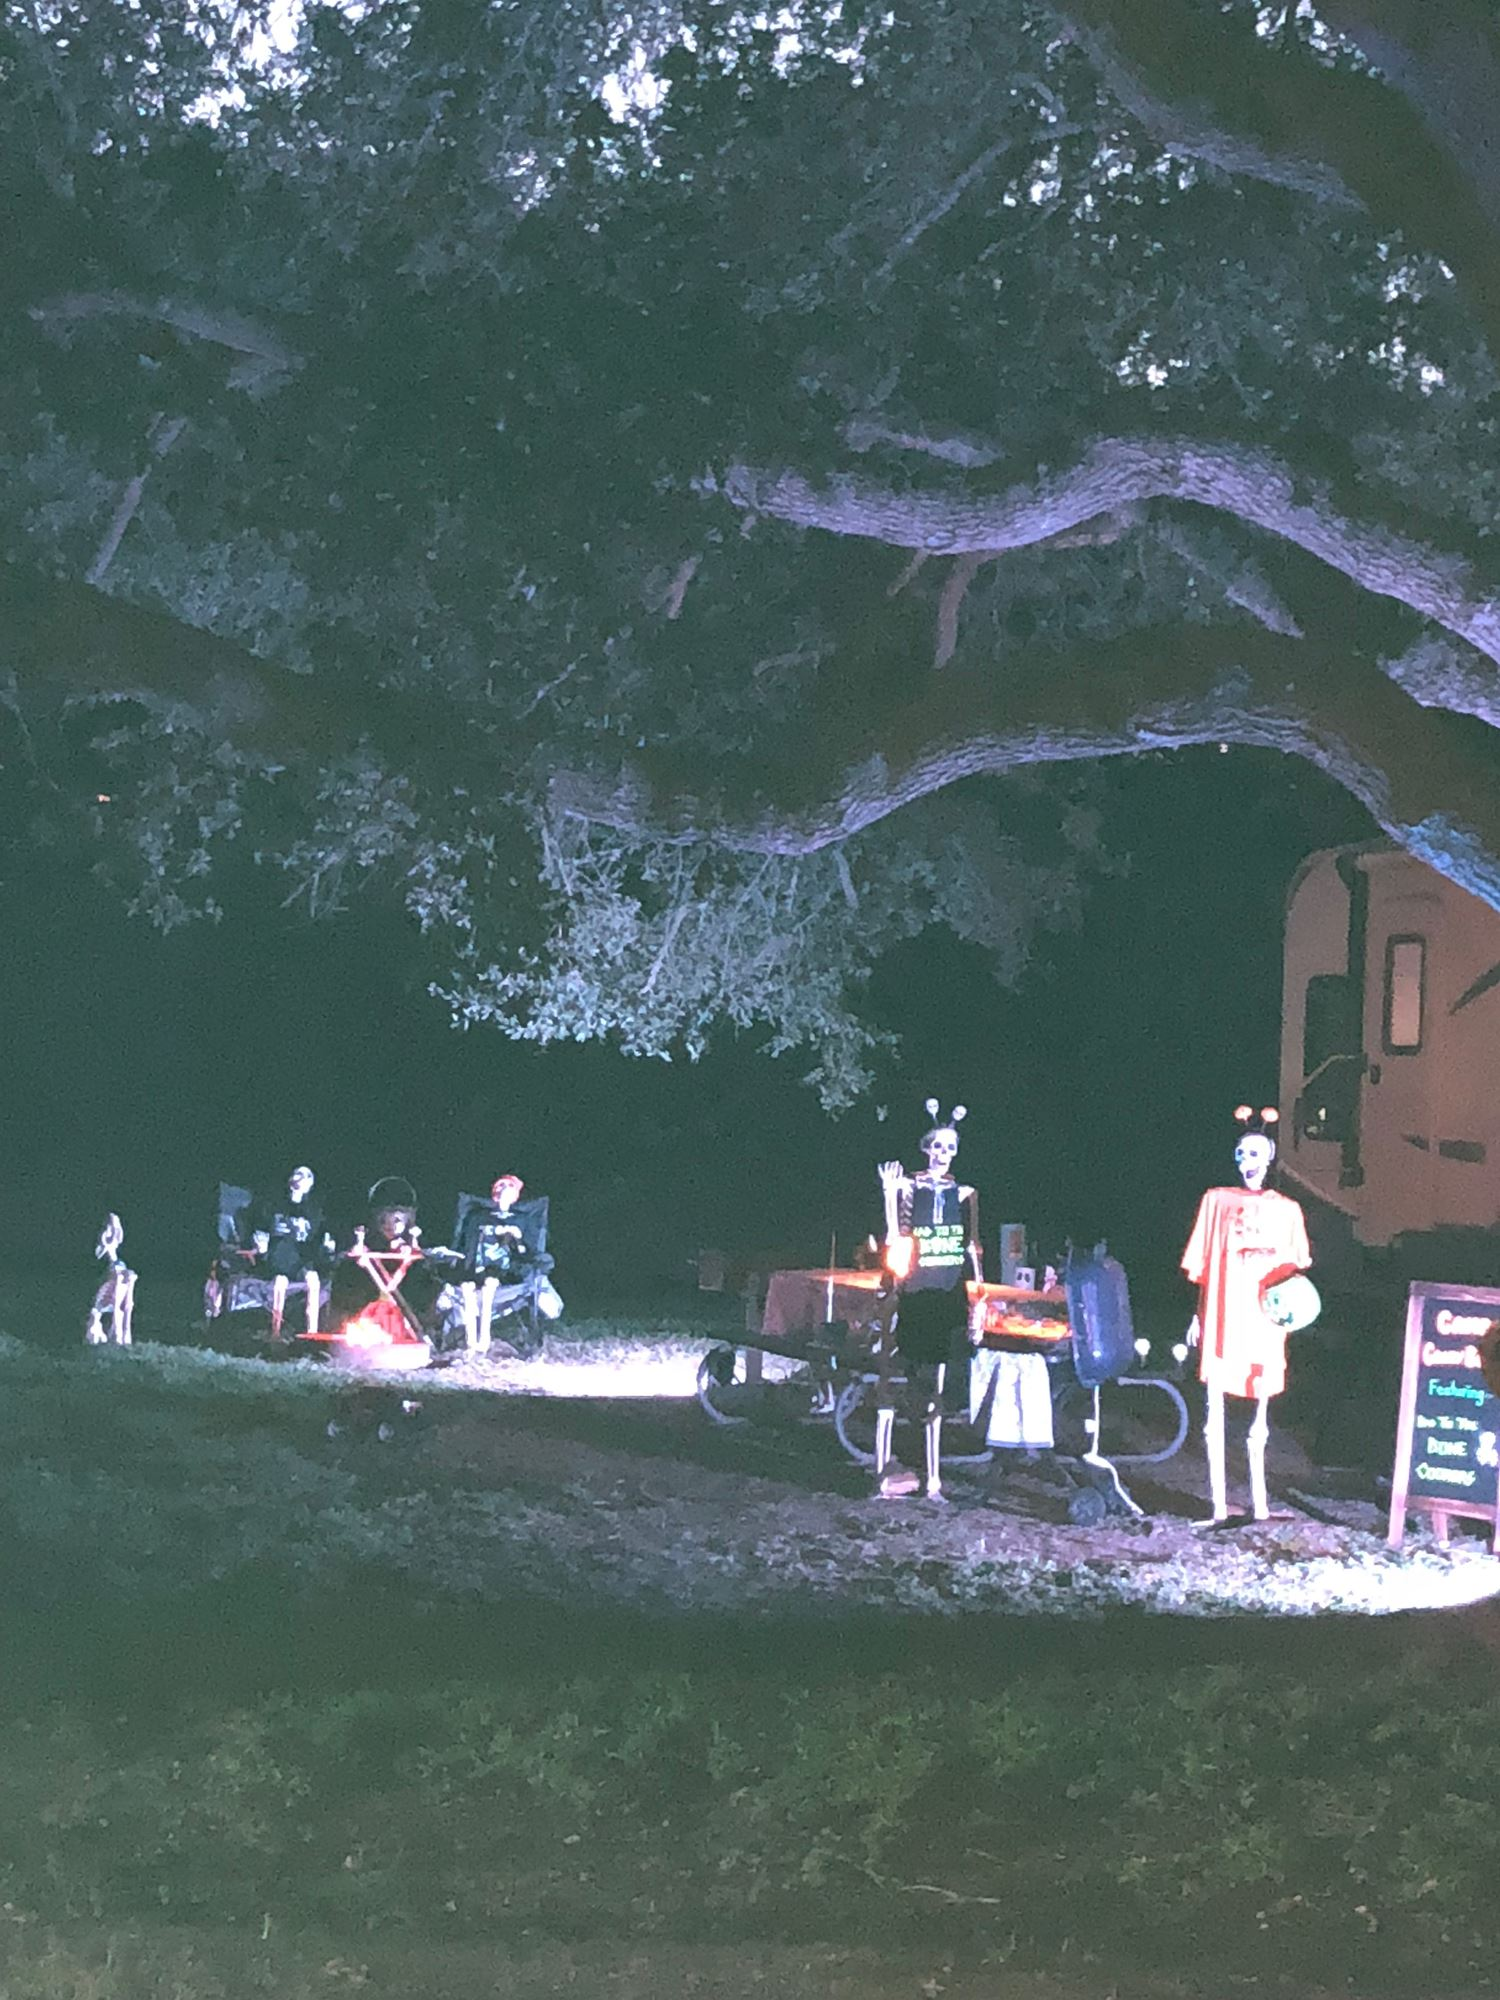 Best Decorated Campsite/Cabin